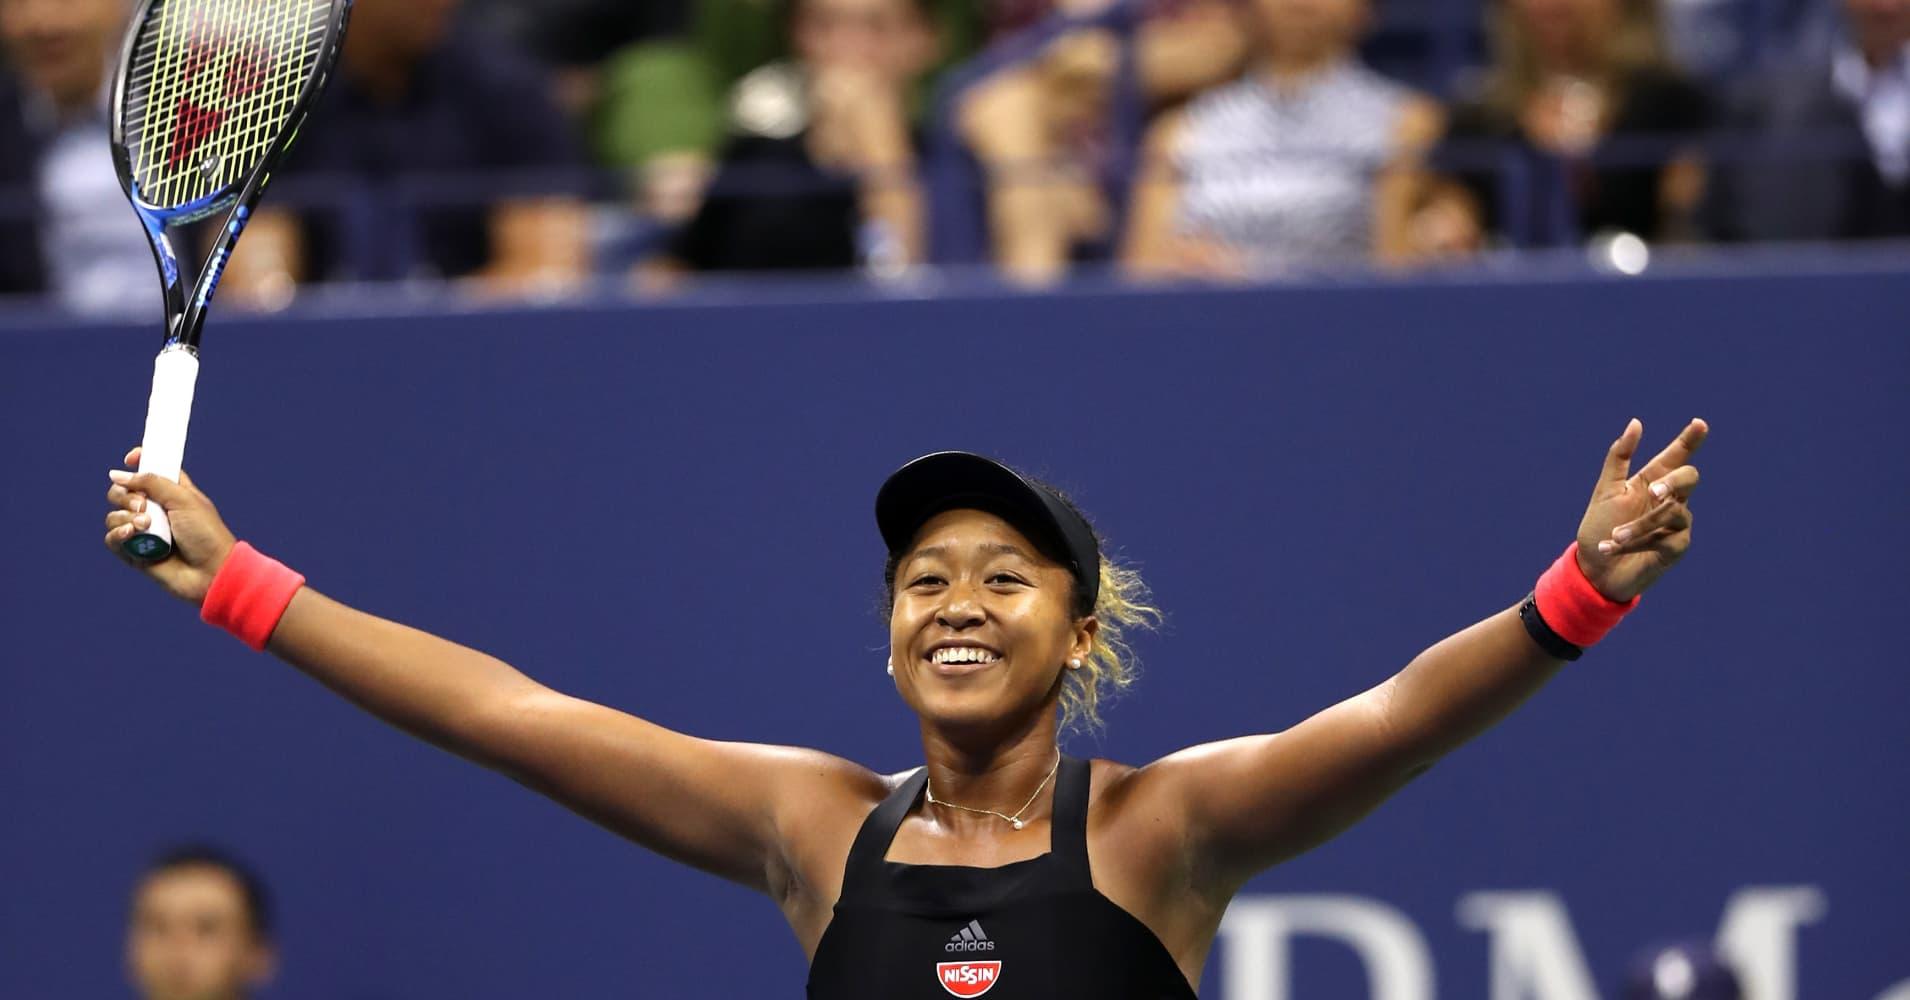 Naomi Osaka of Japan celebrates her semi-final win over Madison Keys at the 2018 US Open